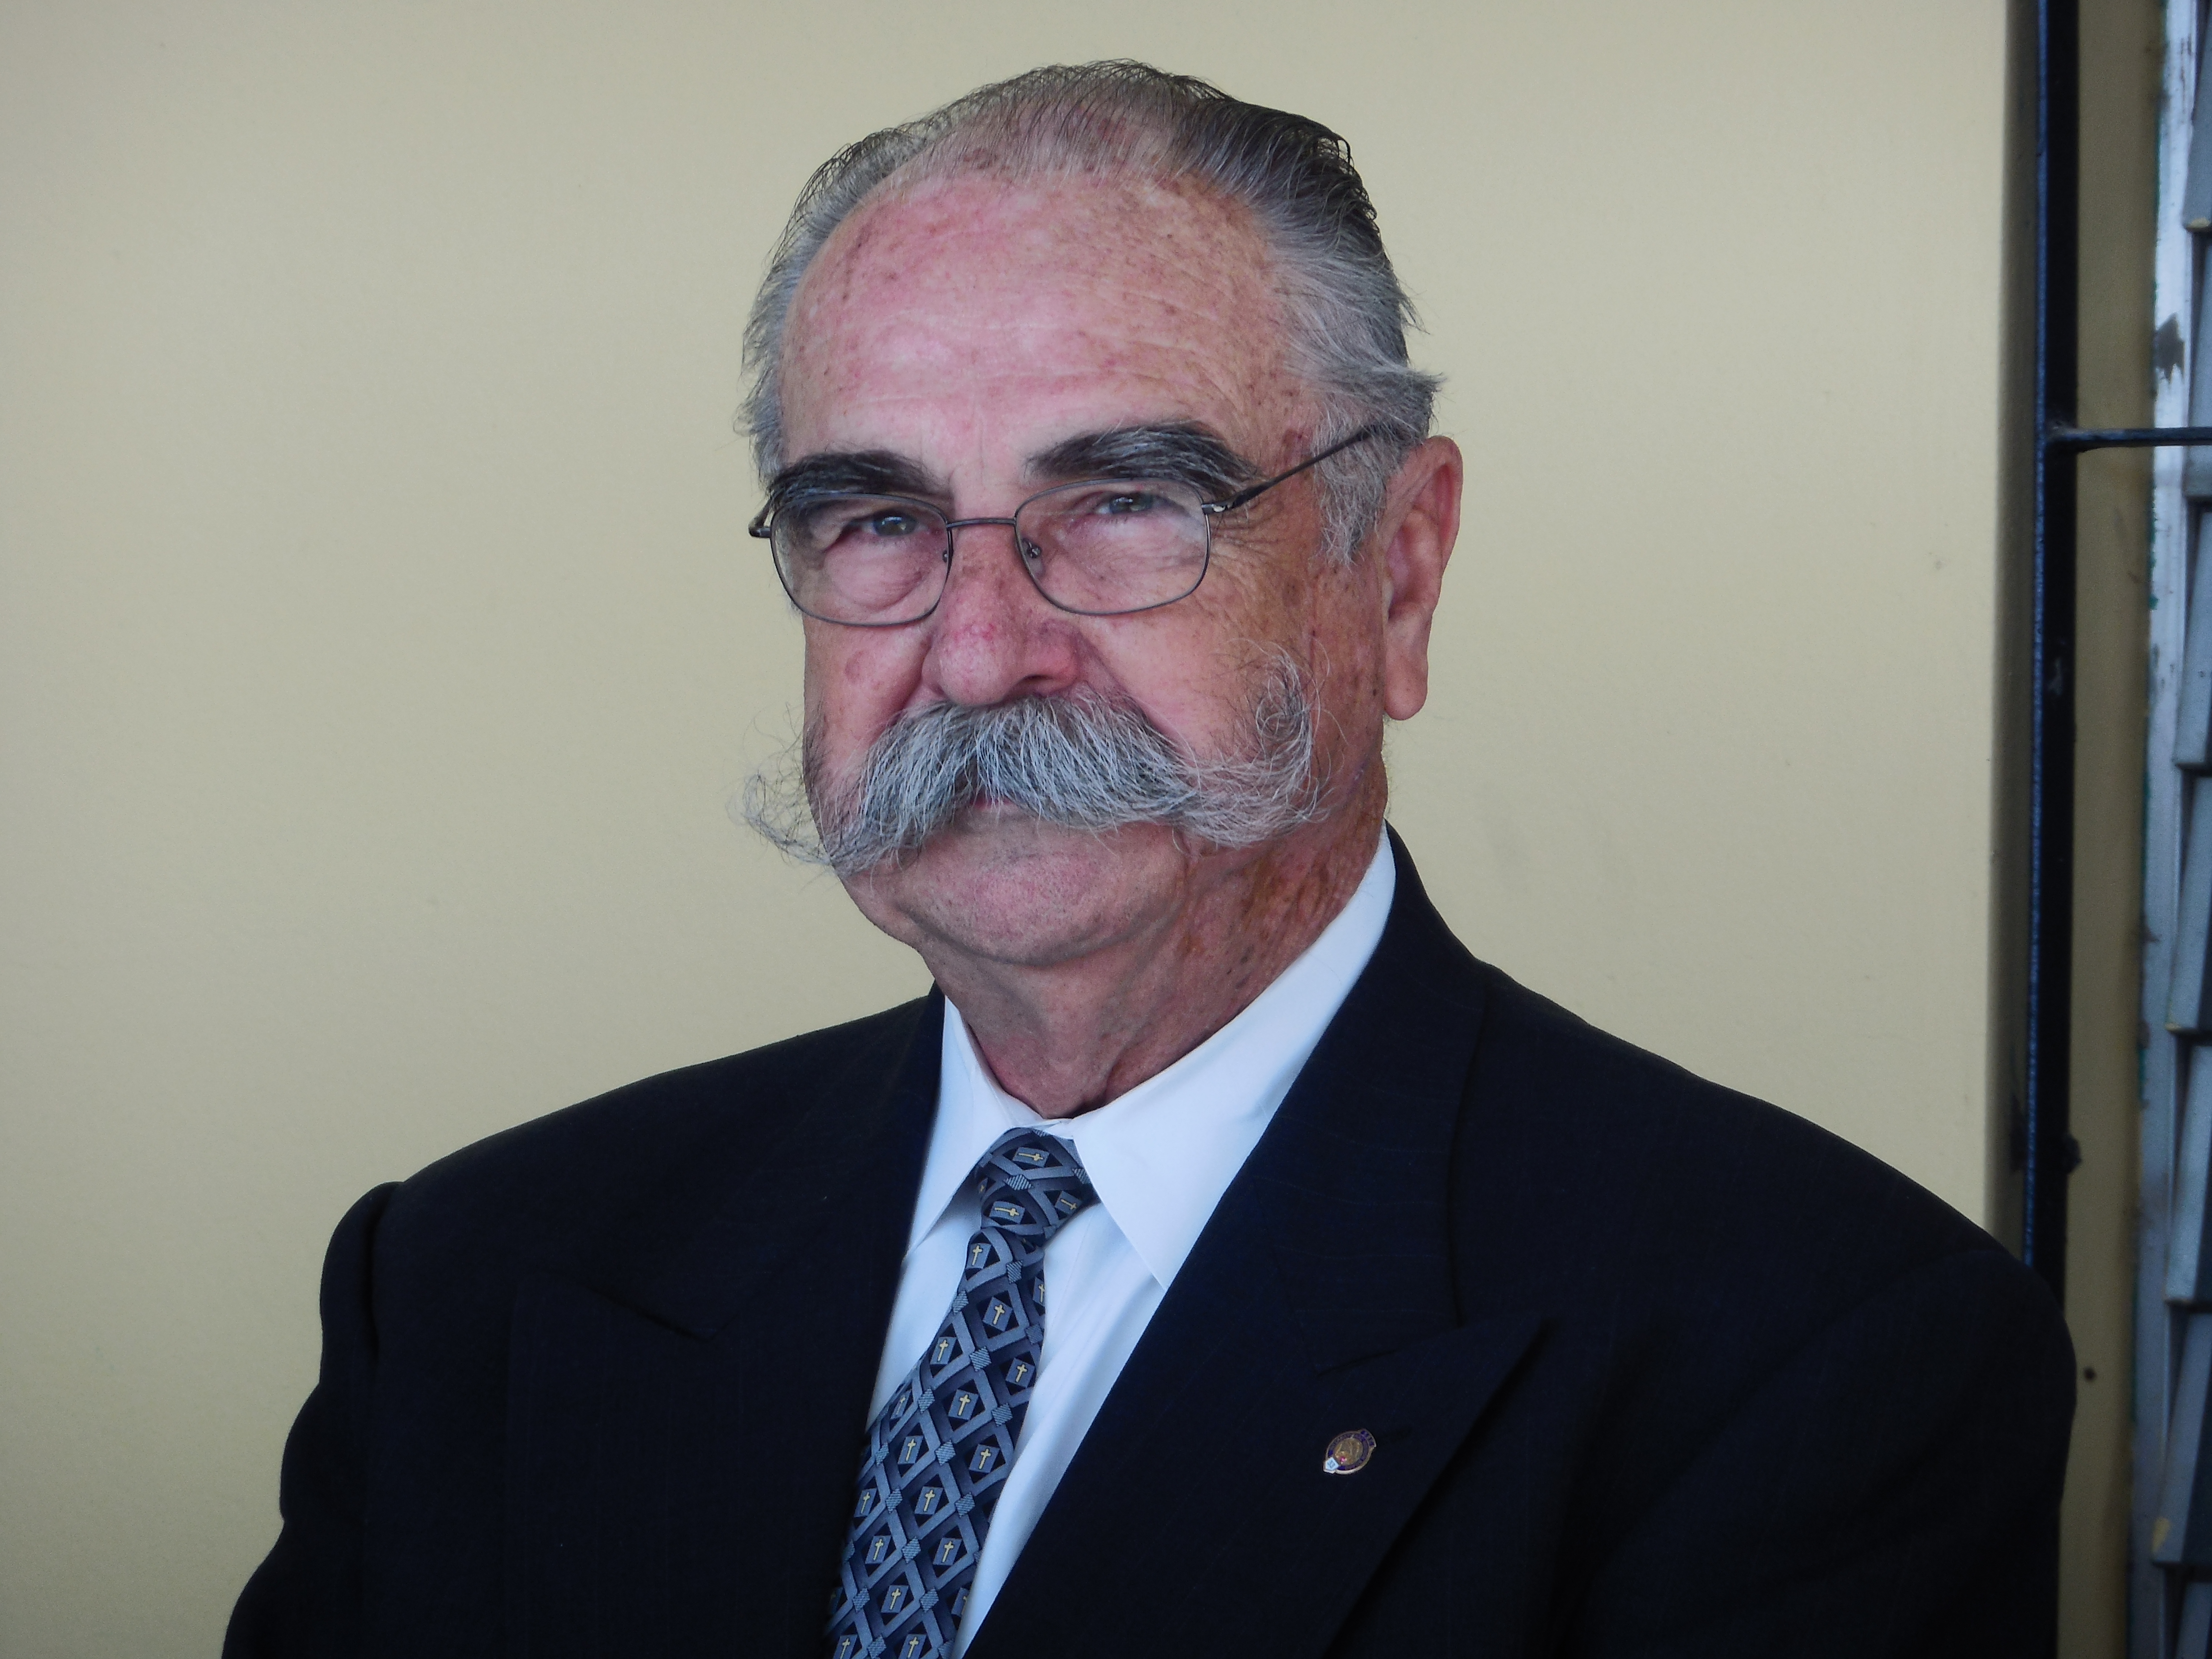 Dr. David Harms